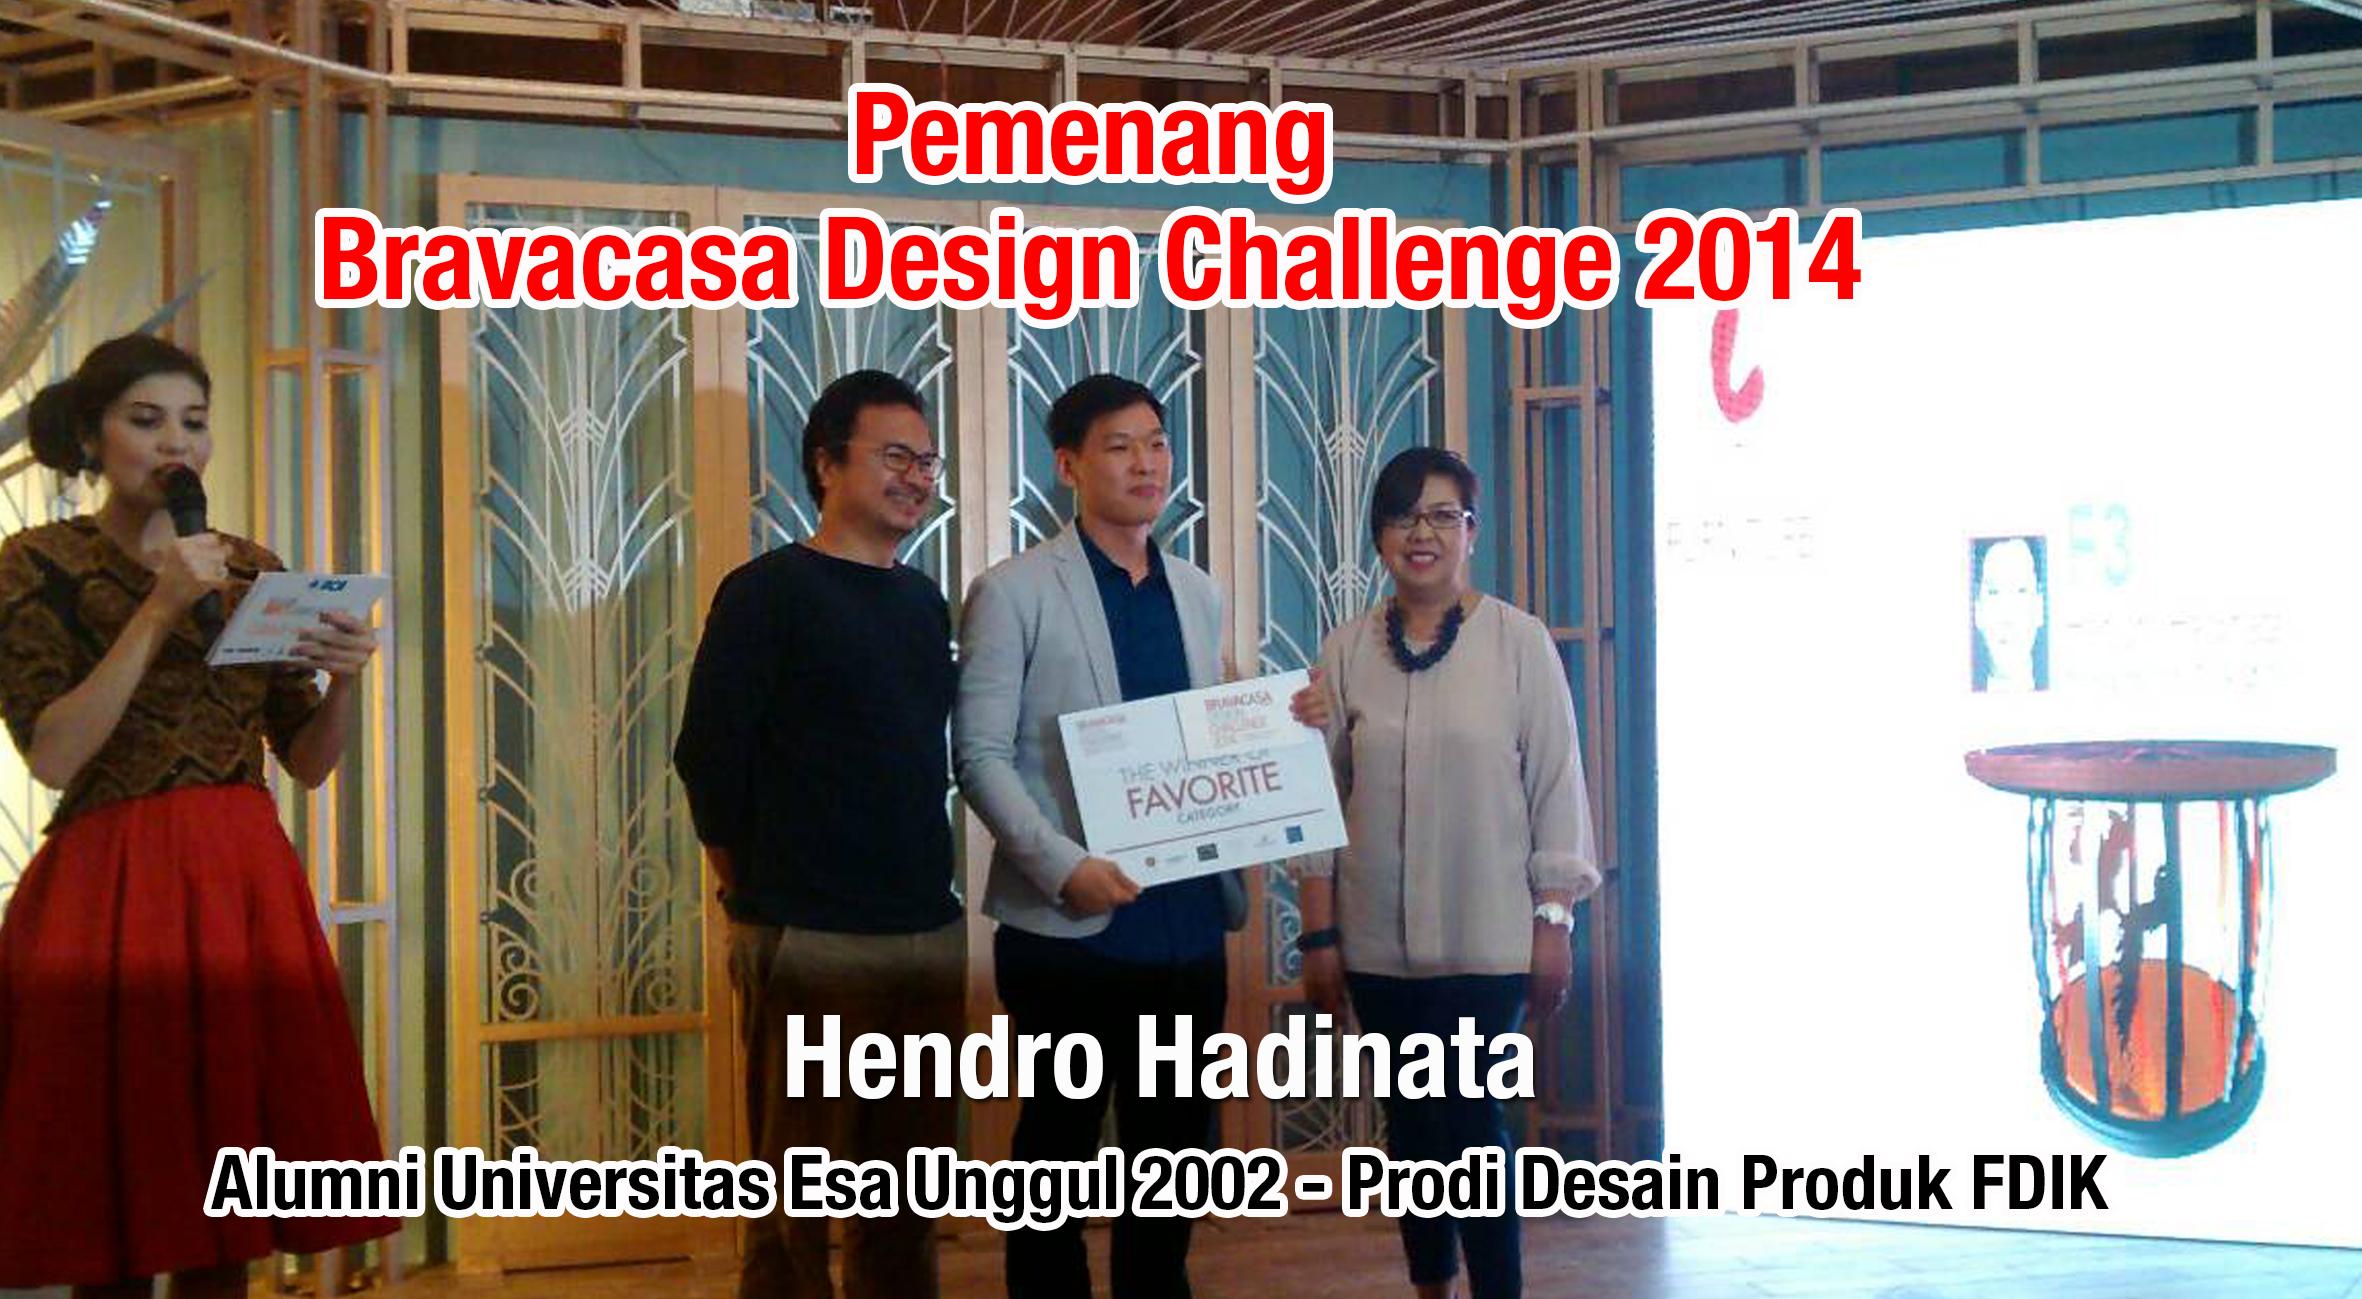 Hendro Hadinata, Alumni Desain Produk FDIK Universitas Esa Unggul 2002 memenangkan Bravacasa Design Challenge 2014